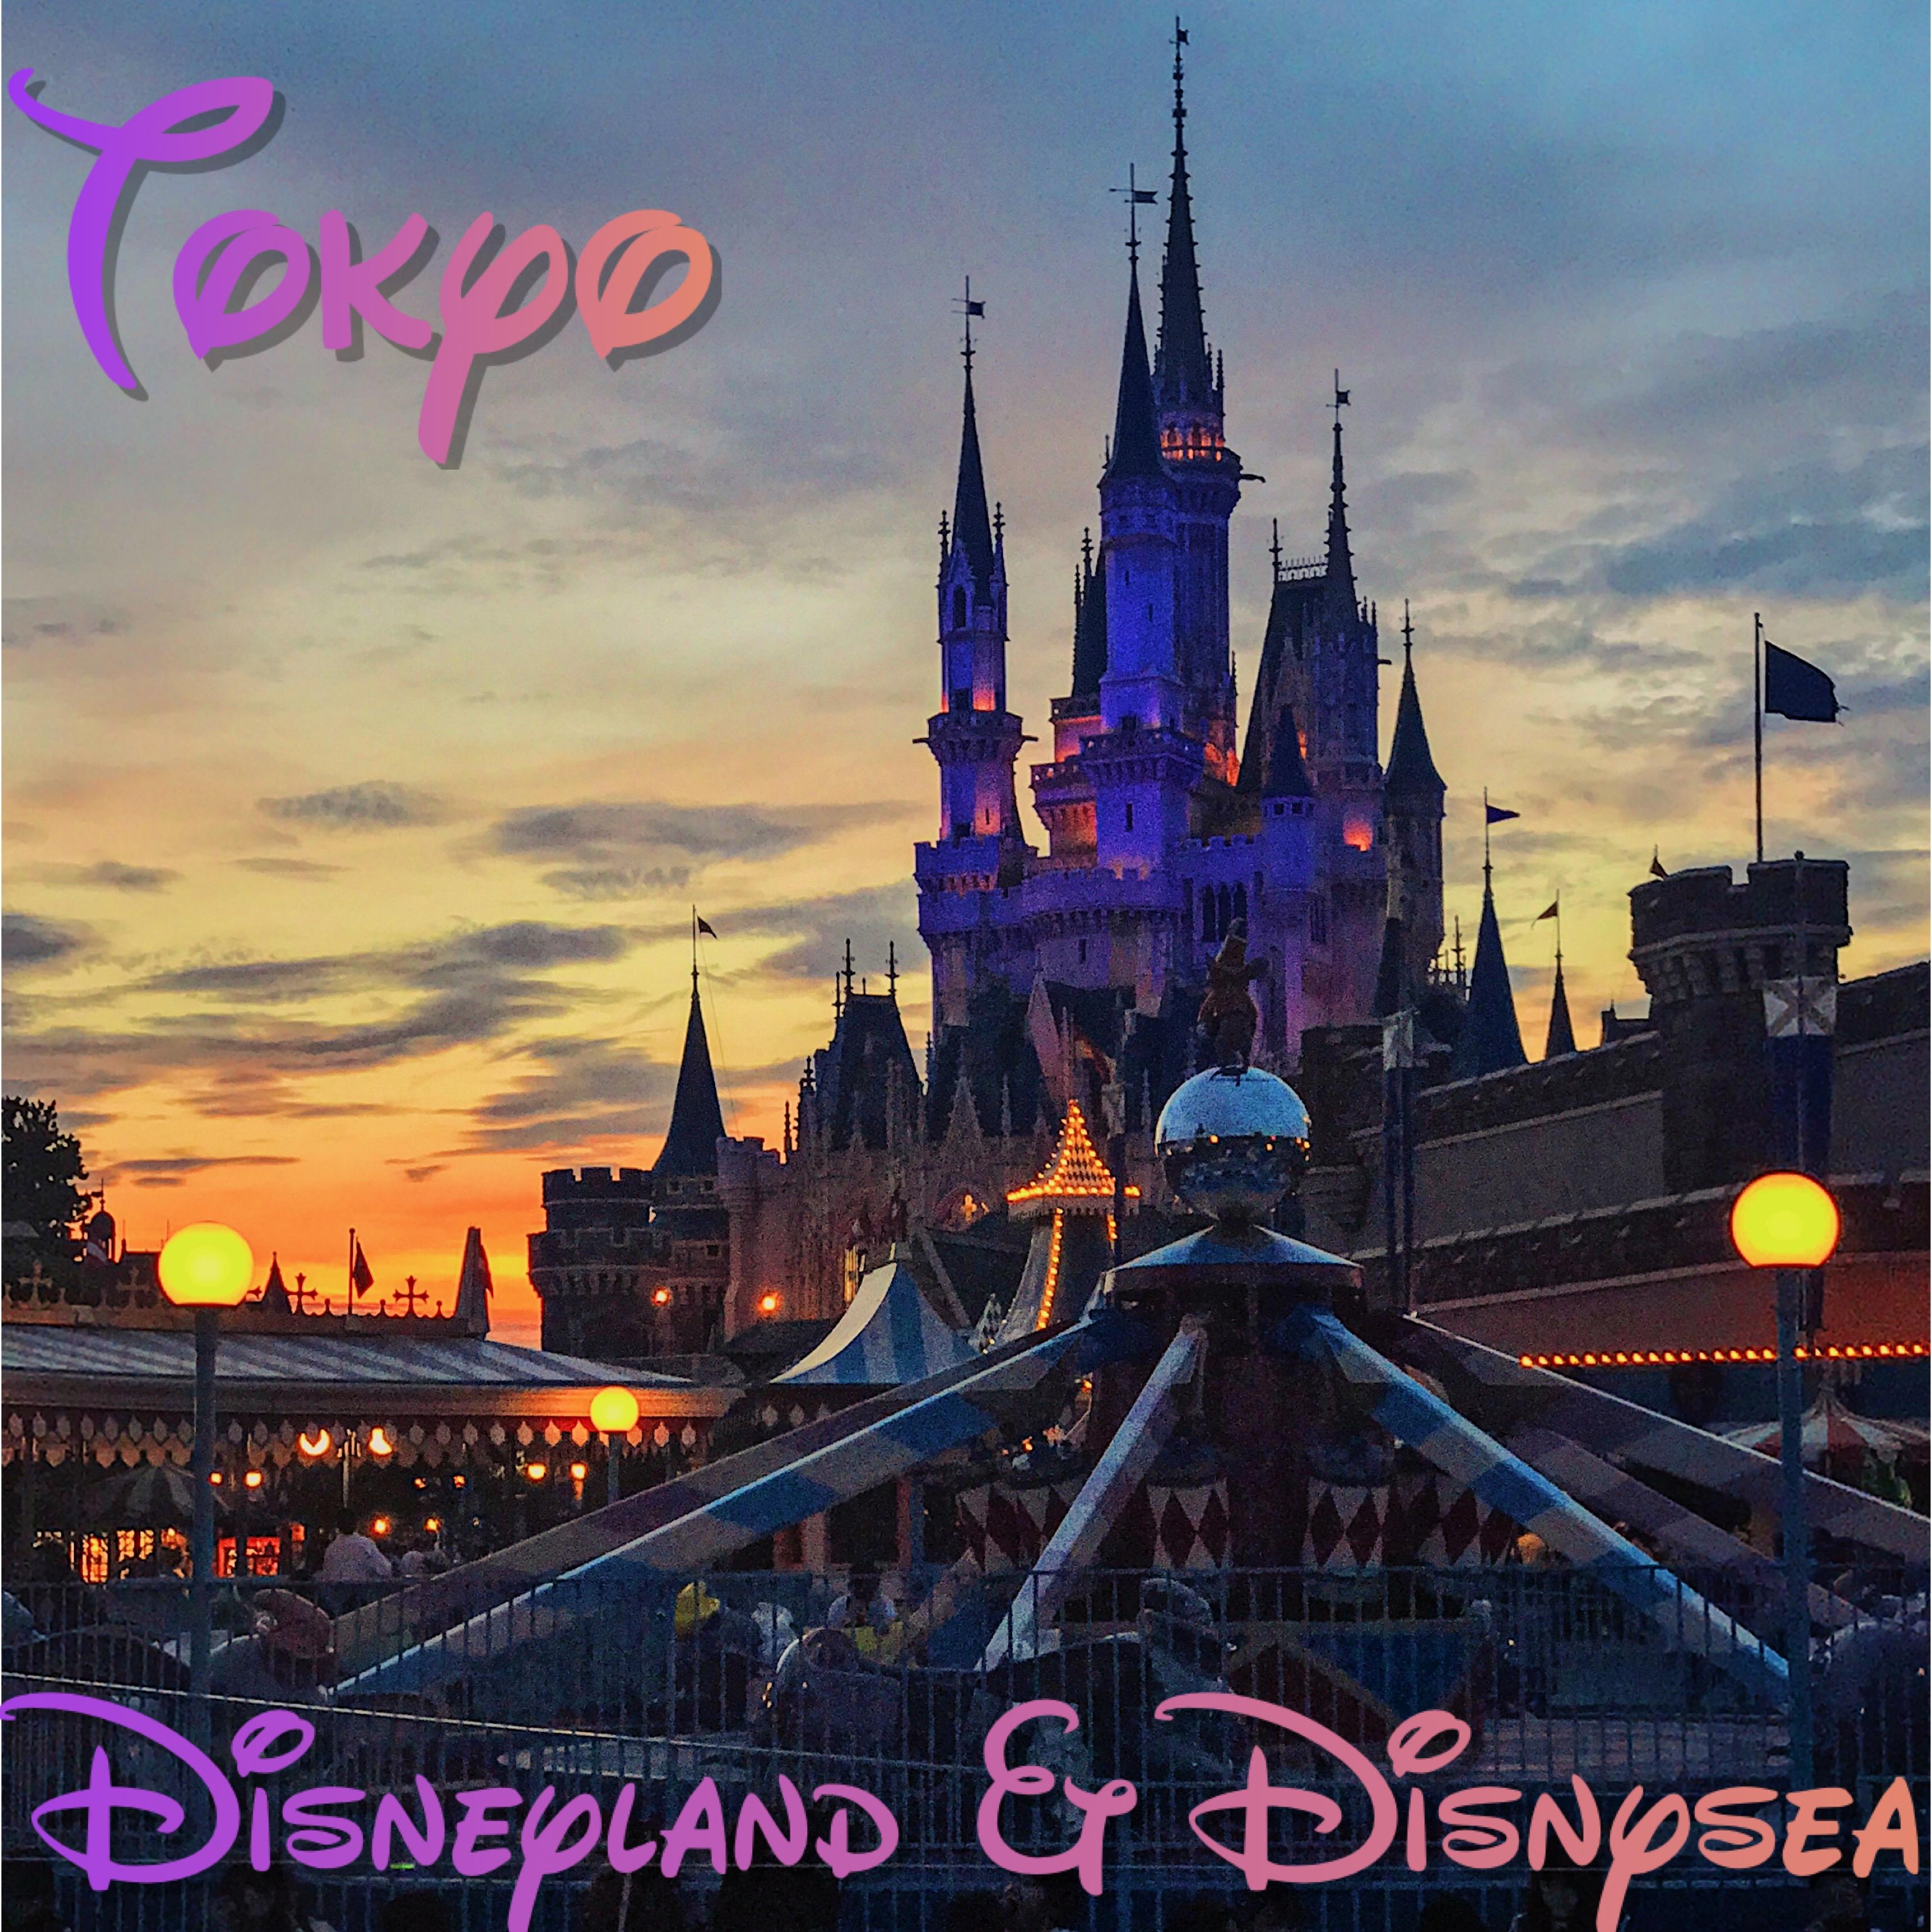 Tokyo DisneyLand & DisneySea